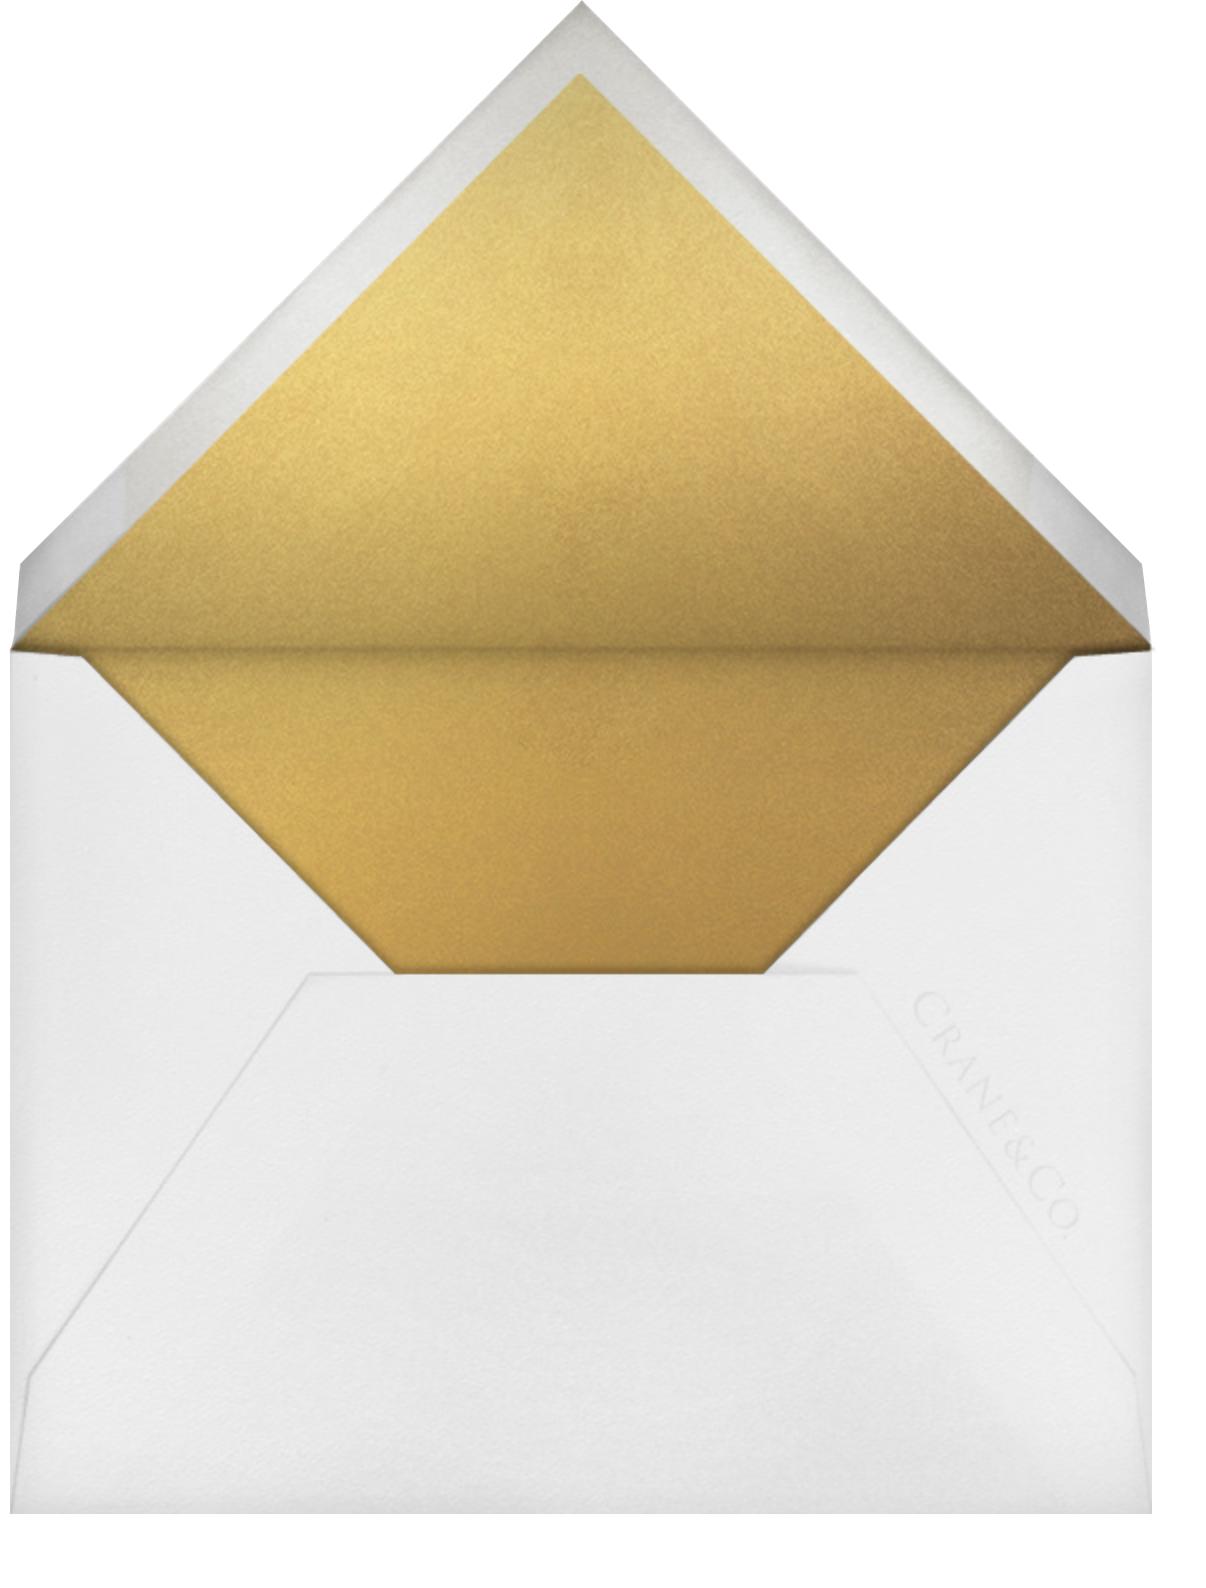 Petals on Lace (Thank You) - Medium Gold - Oscar de la Renta - Envelope